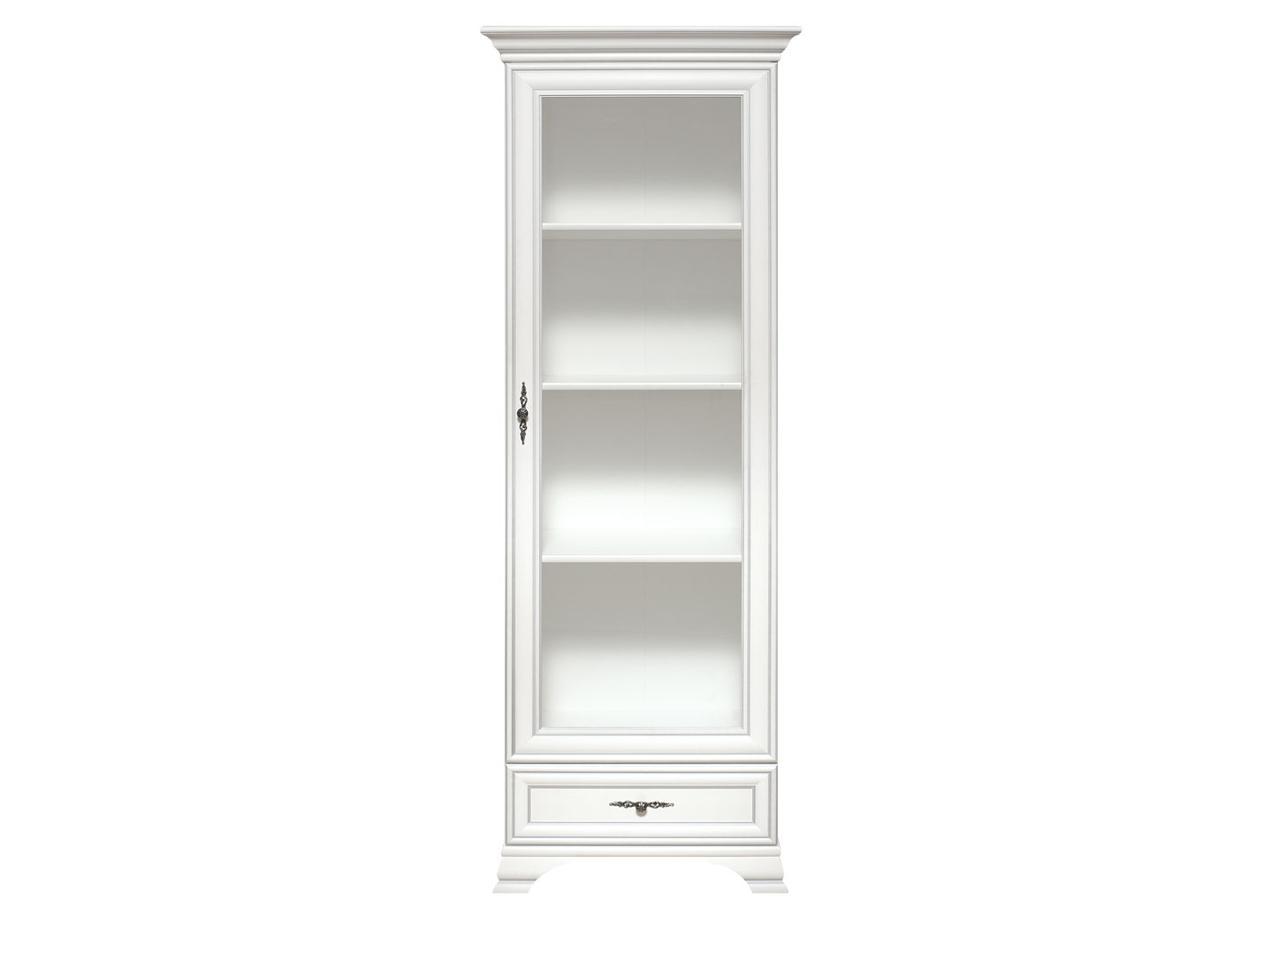 Шкаф витрина 1Д , коллекции Кентаки, Белый, БРВ Брест (Беларусь)